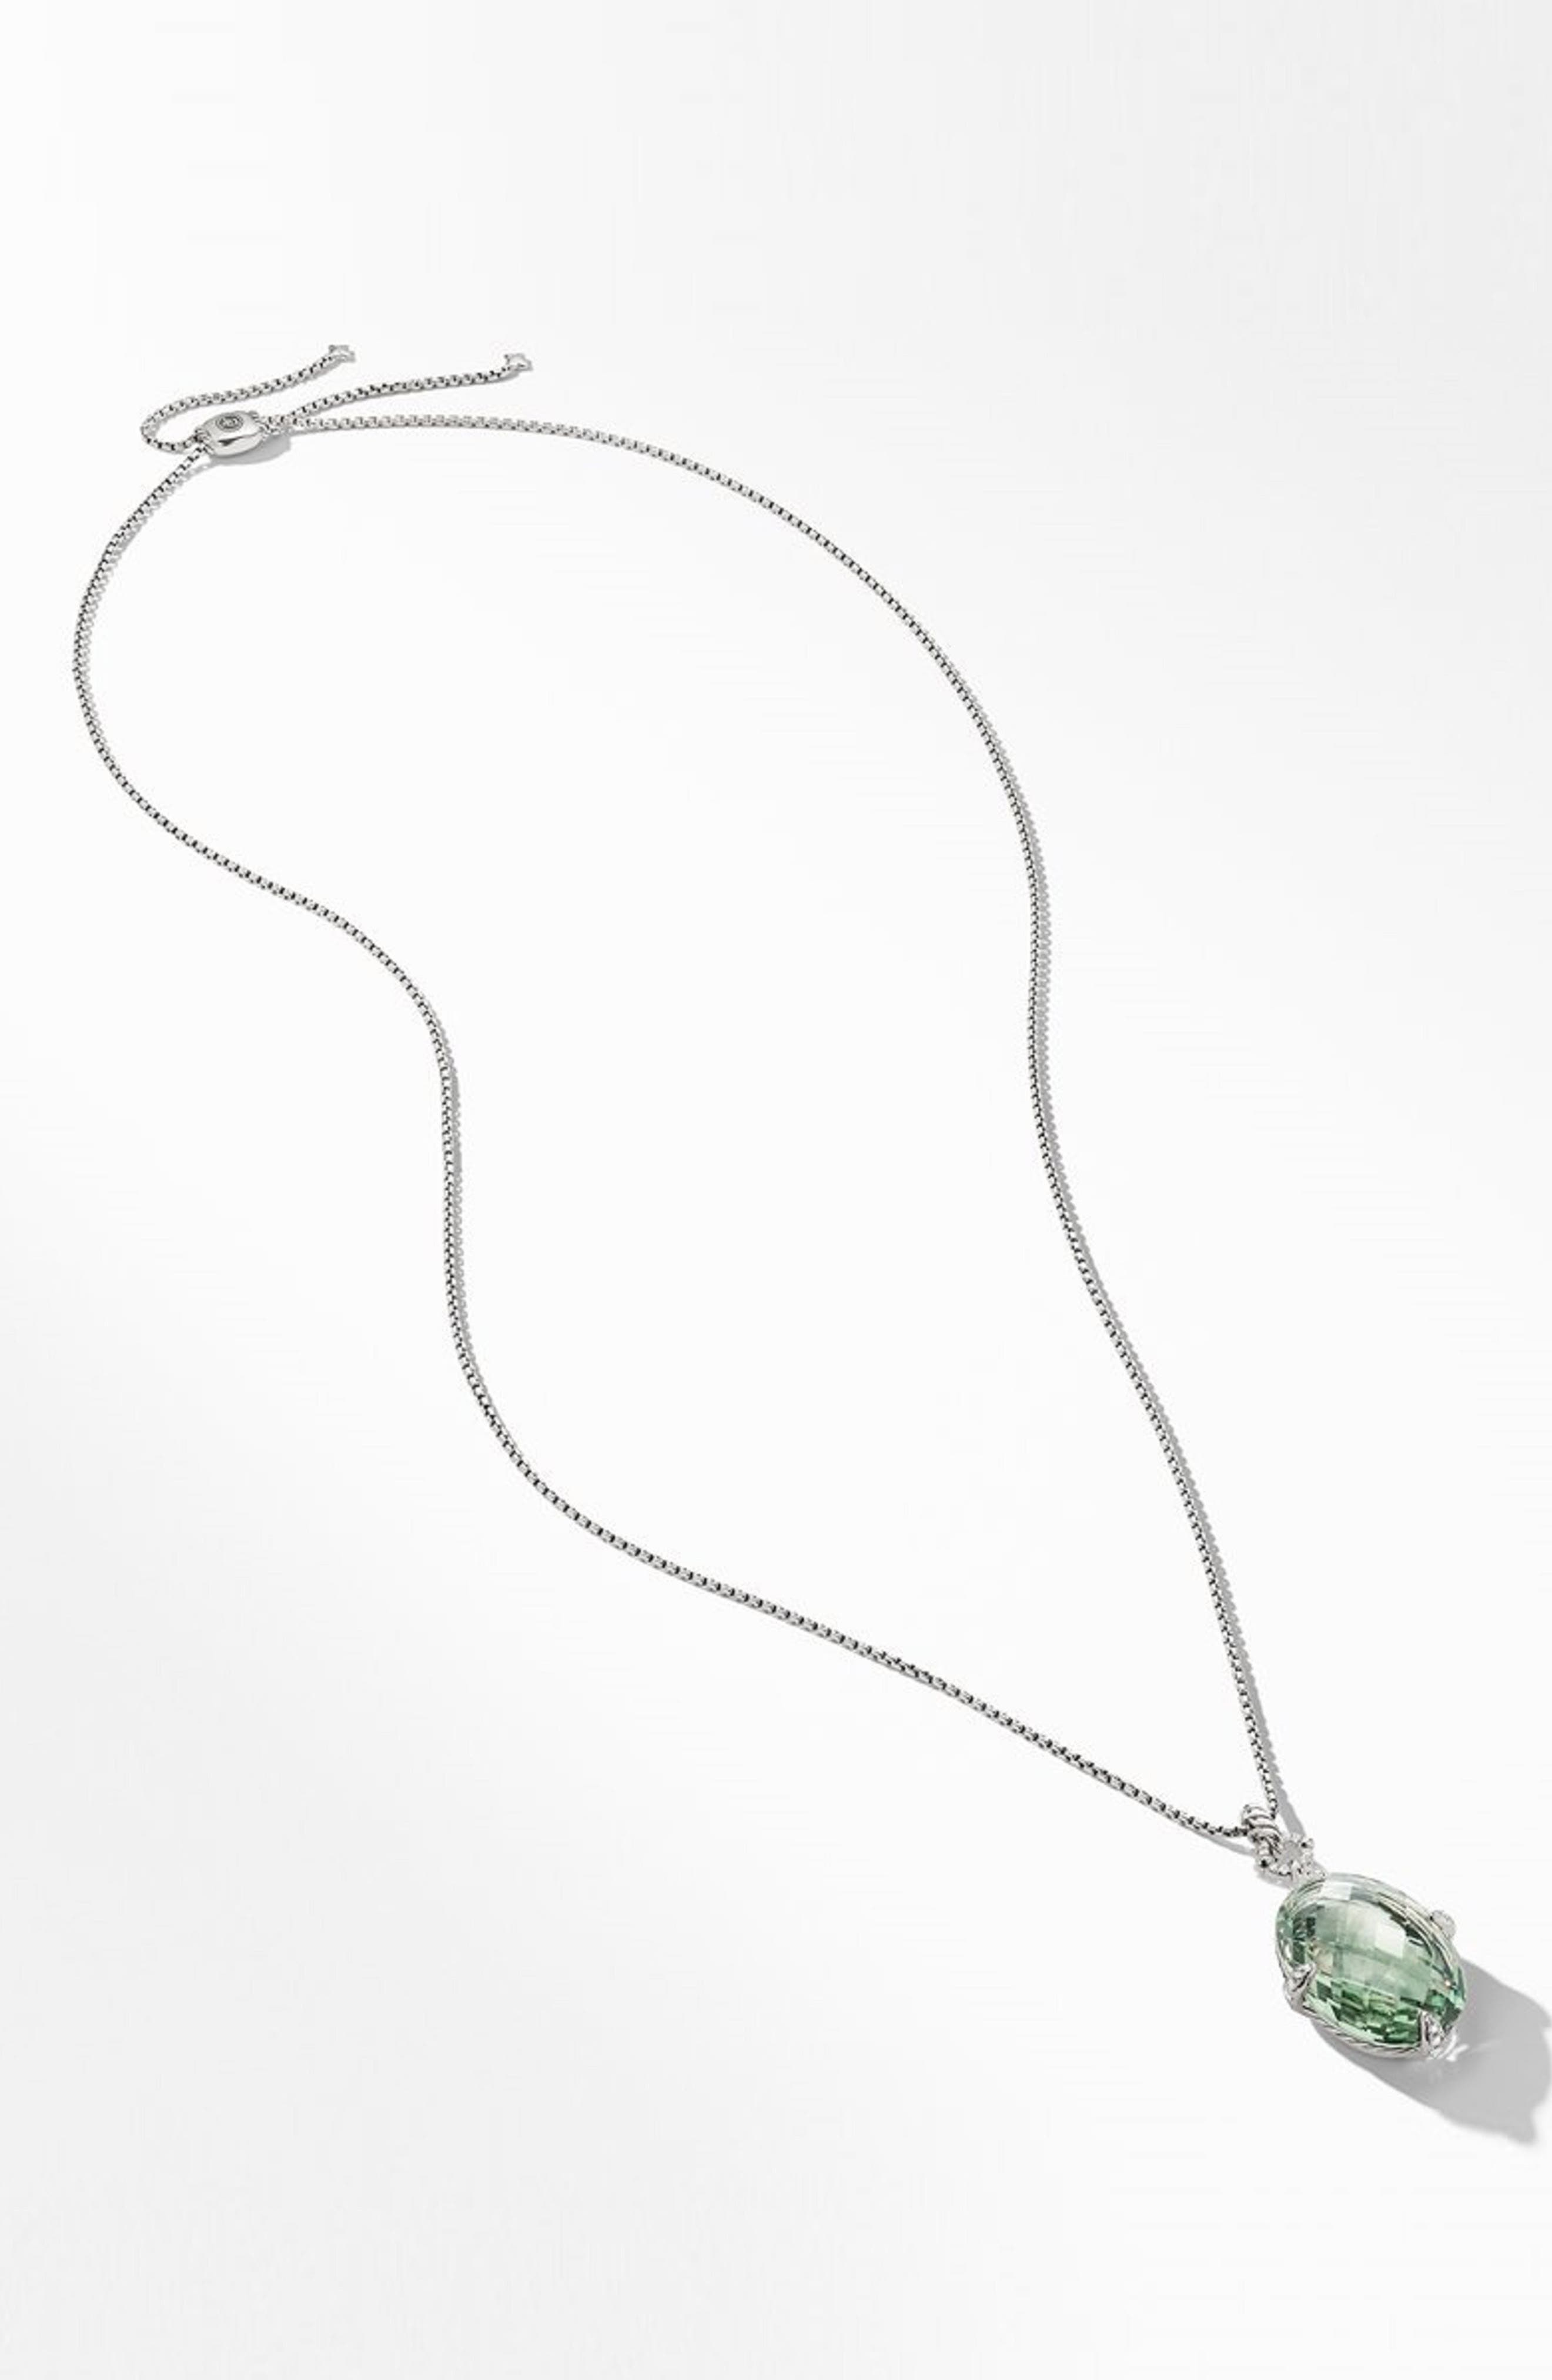 DAVID YURMAN,                             Statement Prasiolite Pendant Necklace with Diamonds,                             Alternate thumbnail 2, color,                             SILVER/ DIAMOND/ PRASIOLITE